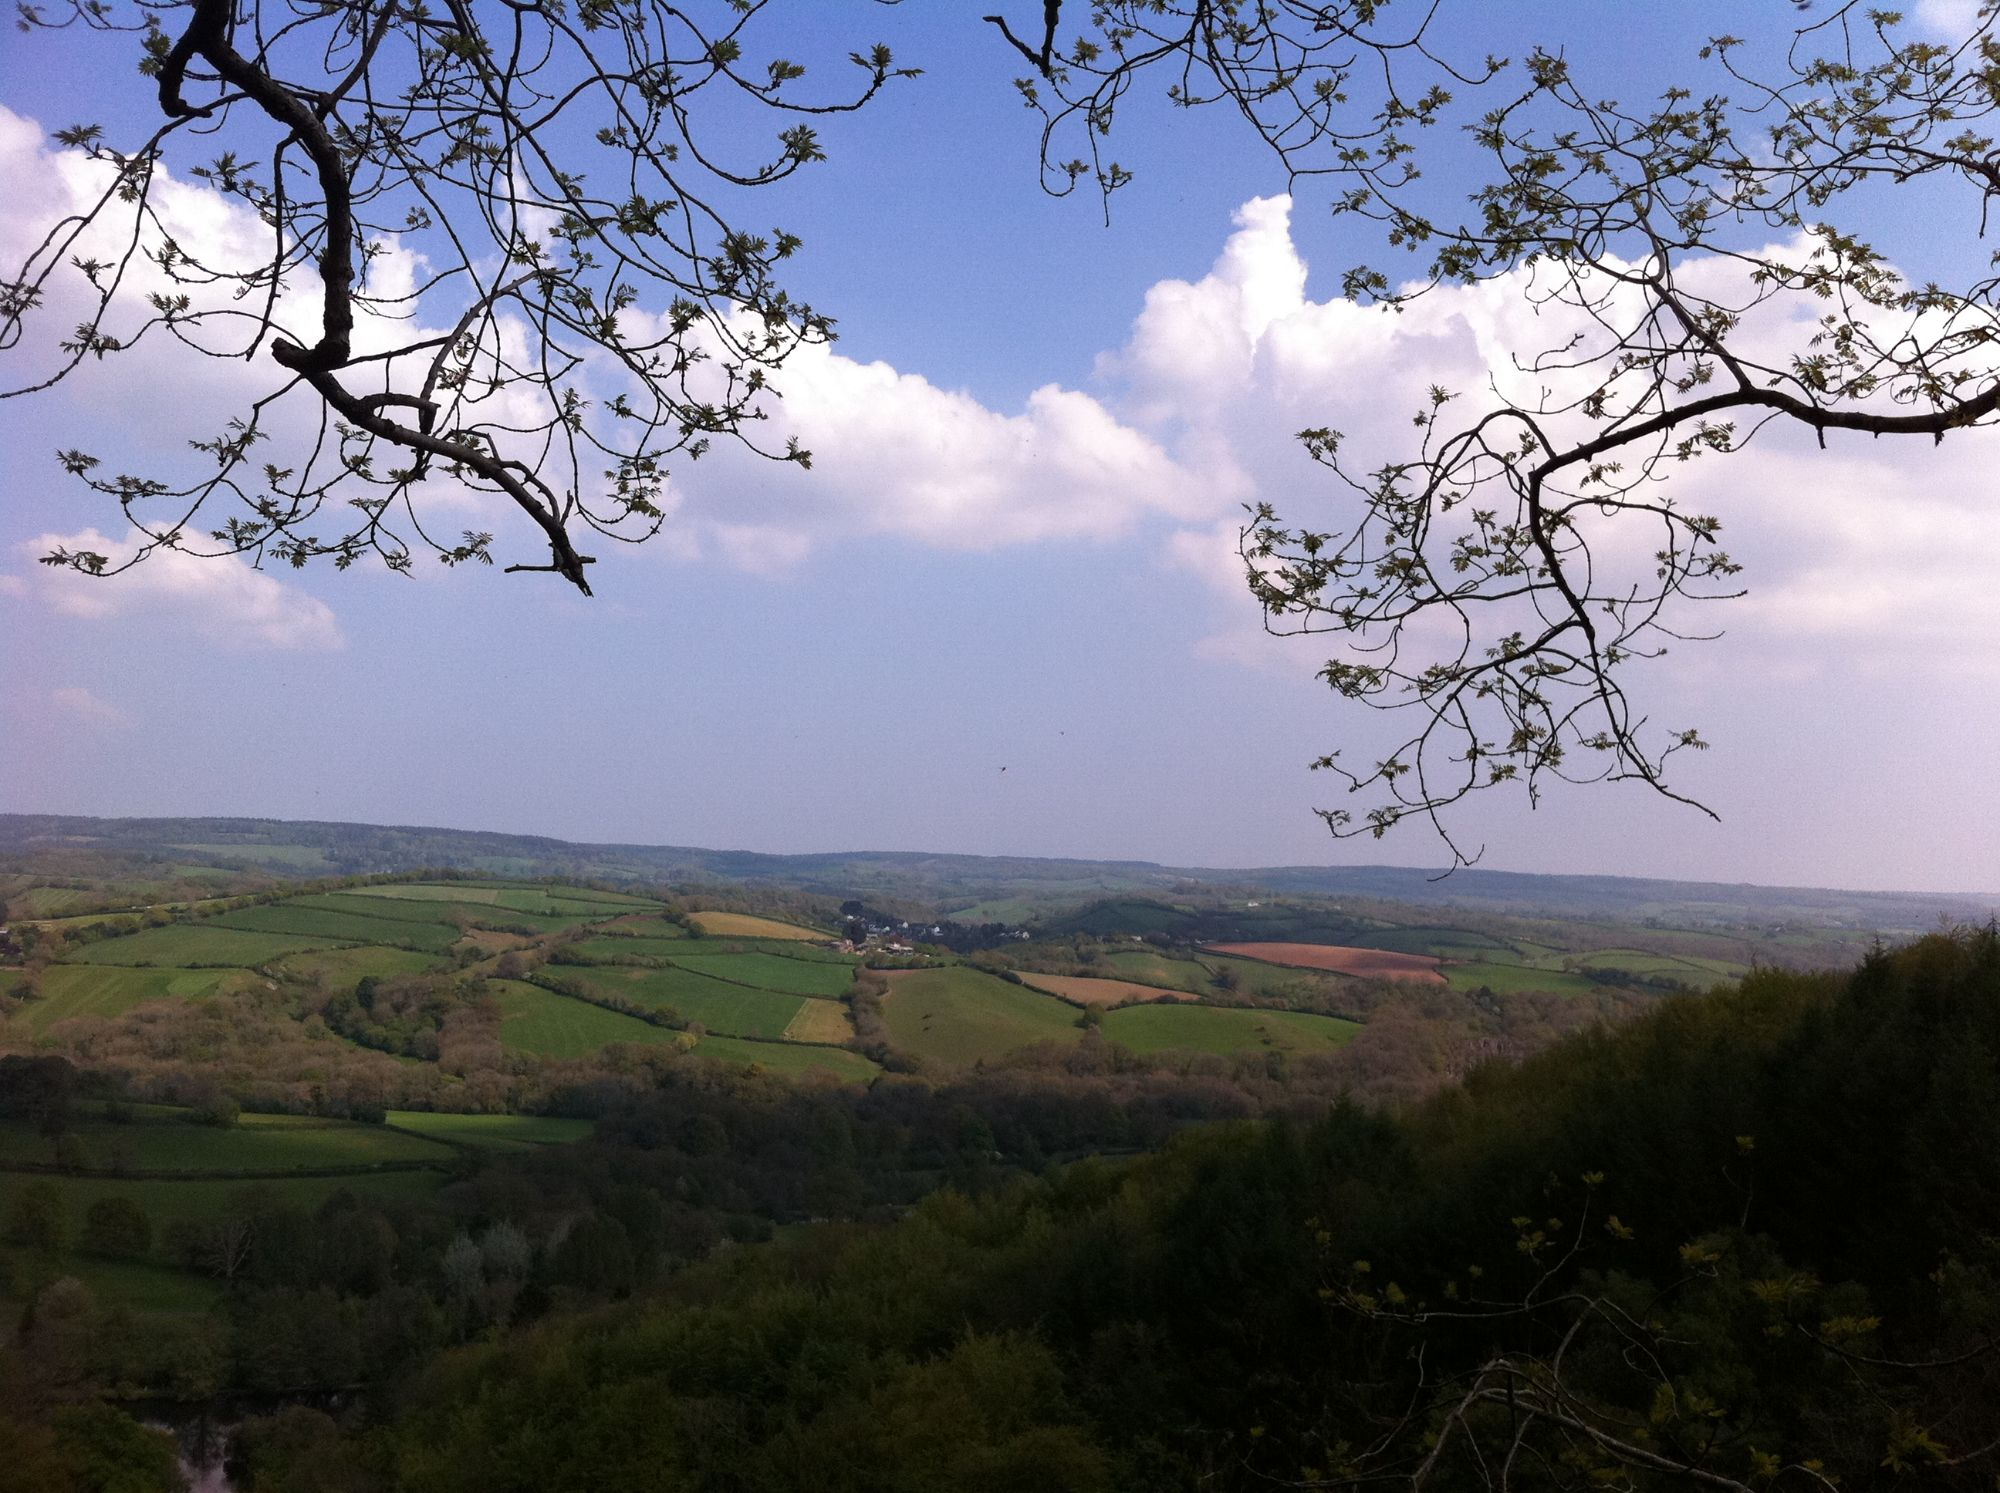 free stock photo British Countryside views landscape green fields